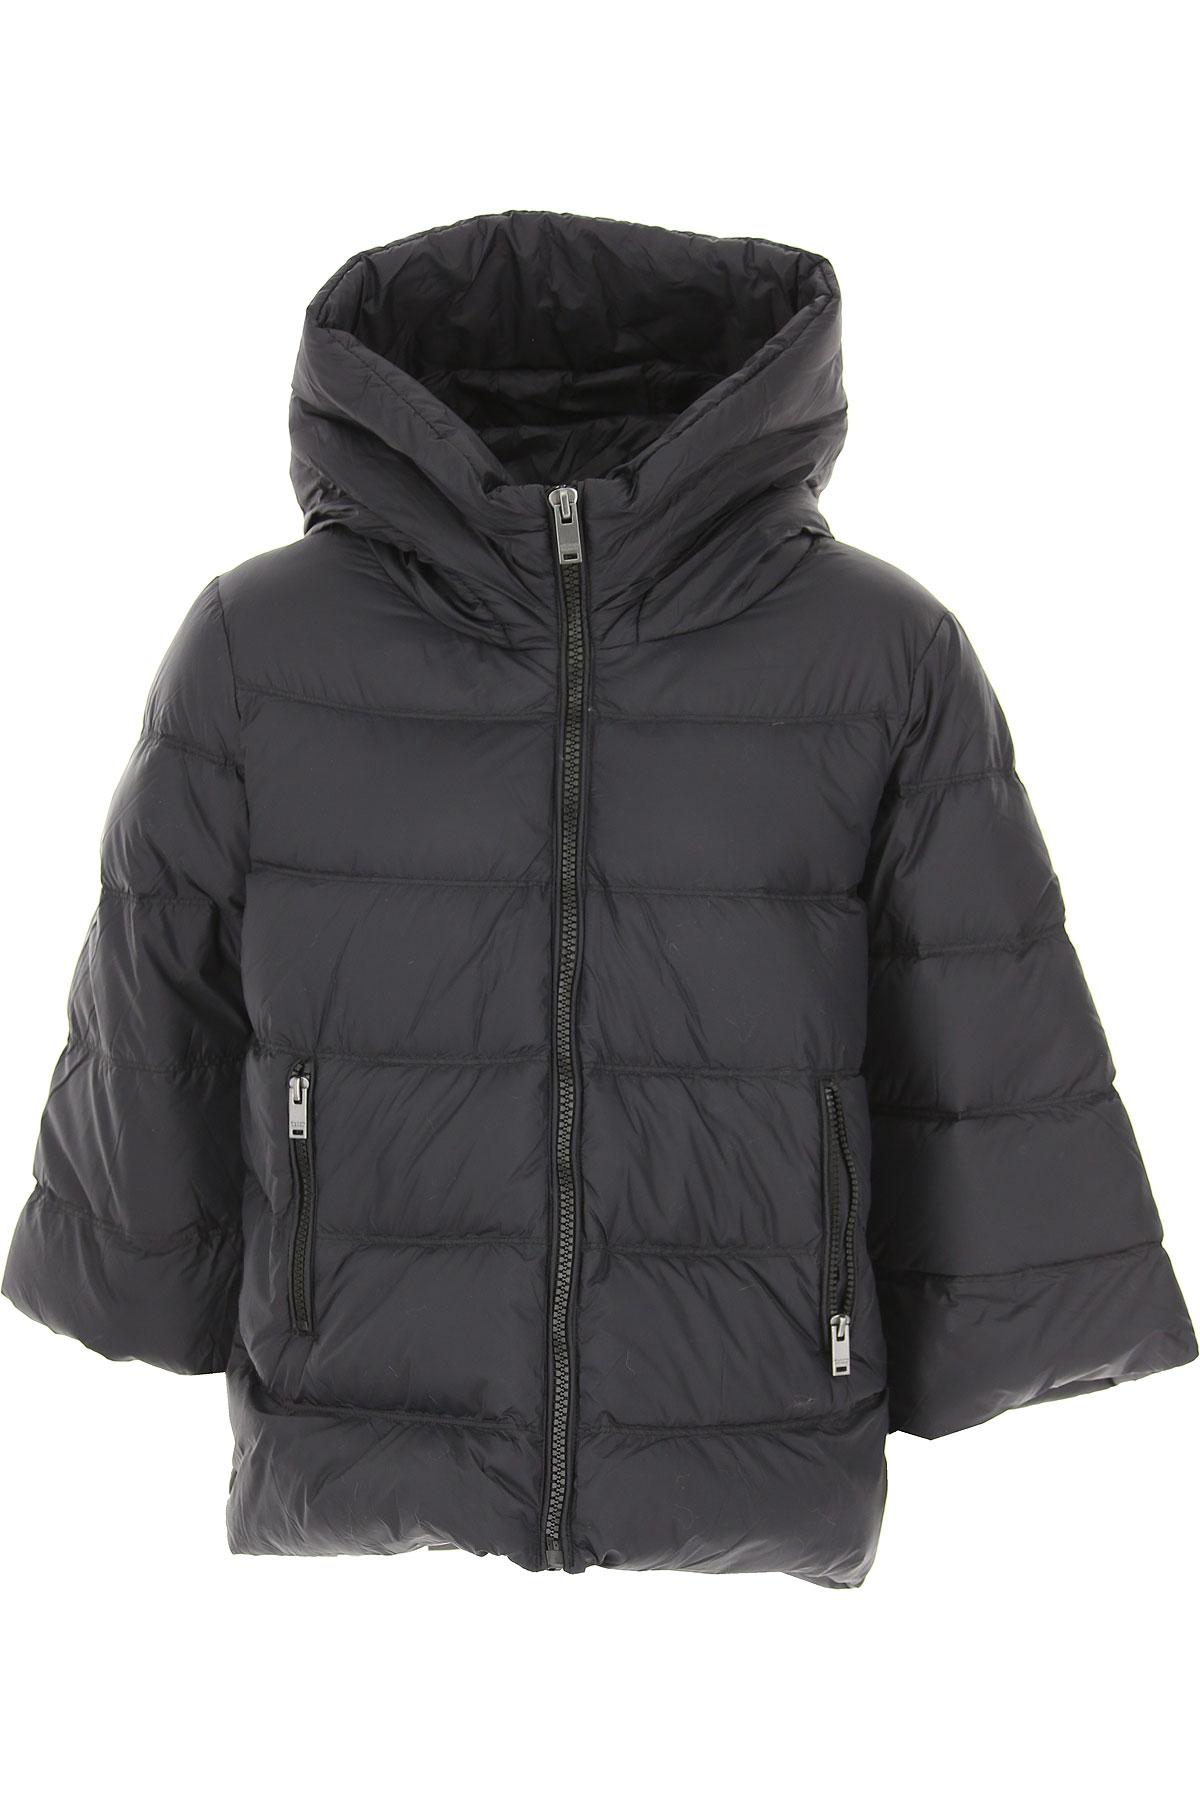 Image of Silvian Heach Jacket for Women, Black, Nylon, 2017, 10 4 6 8